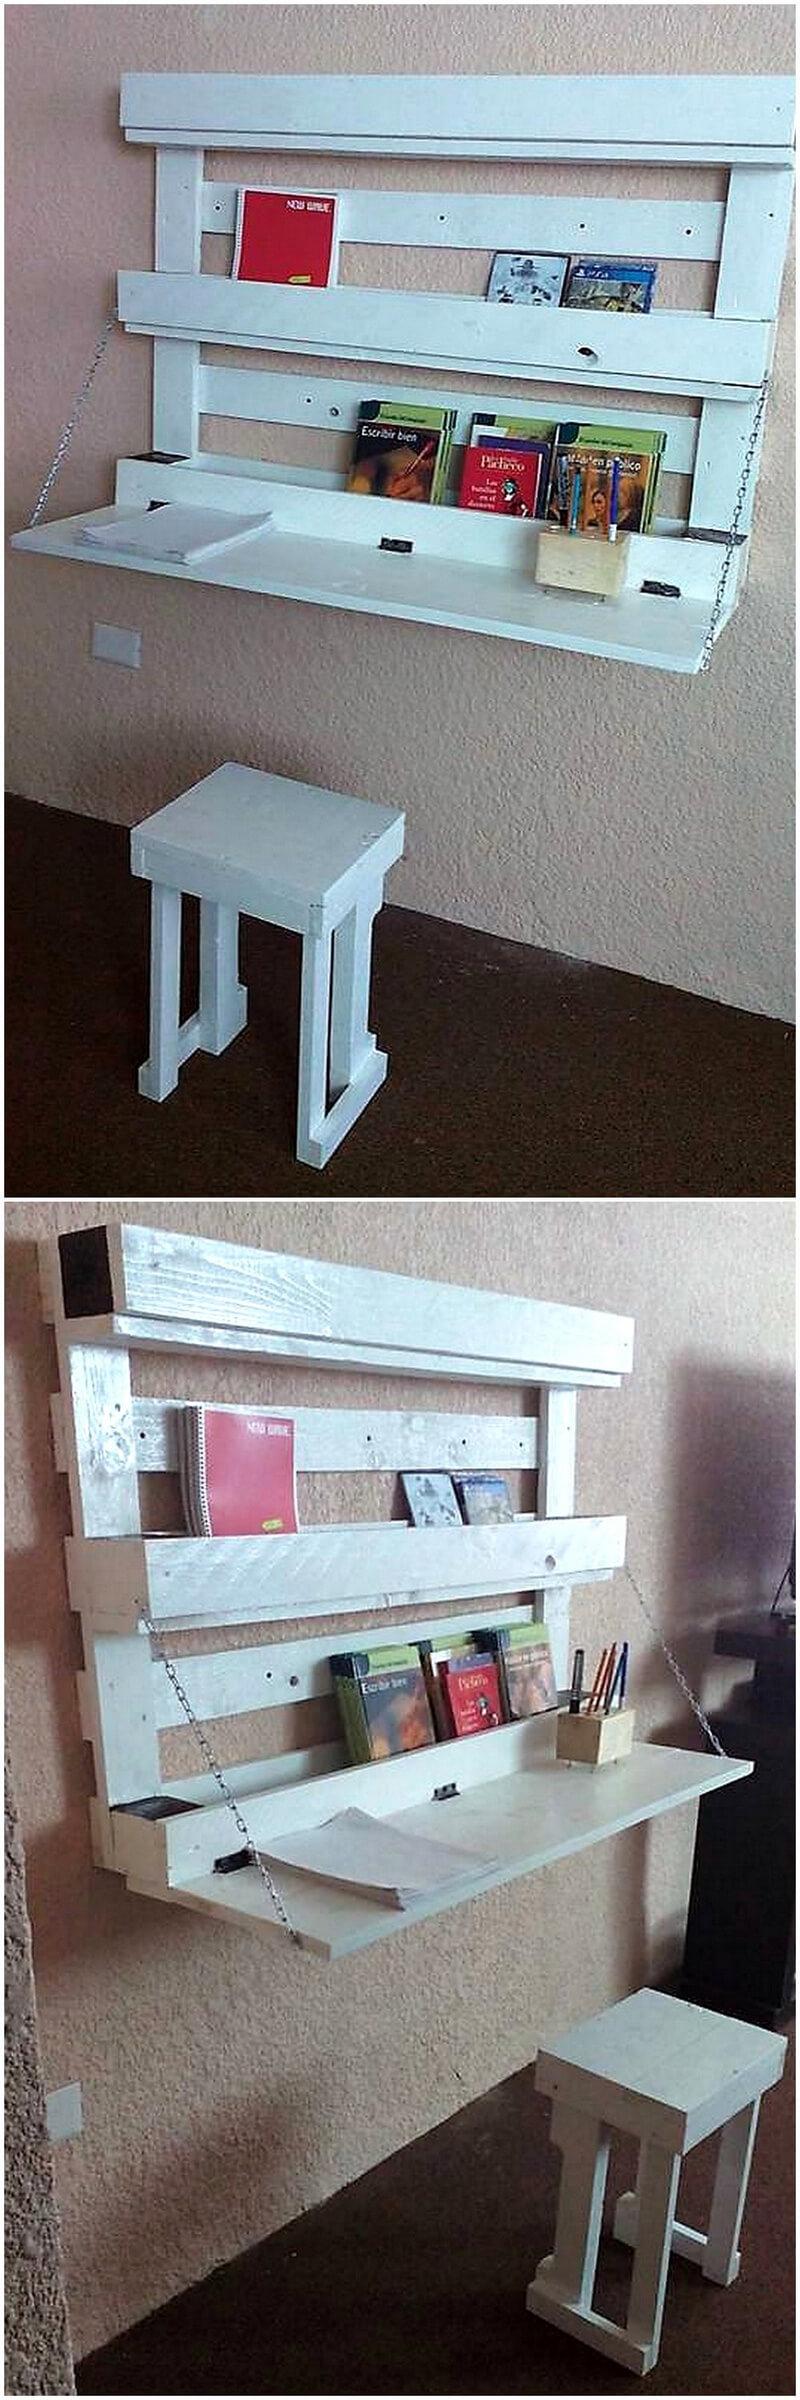 pallets hanging study desk idea